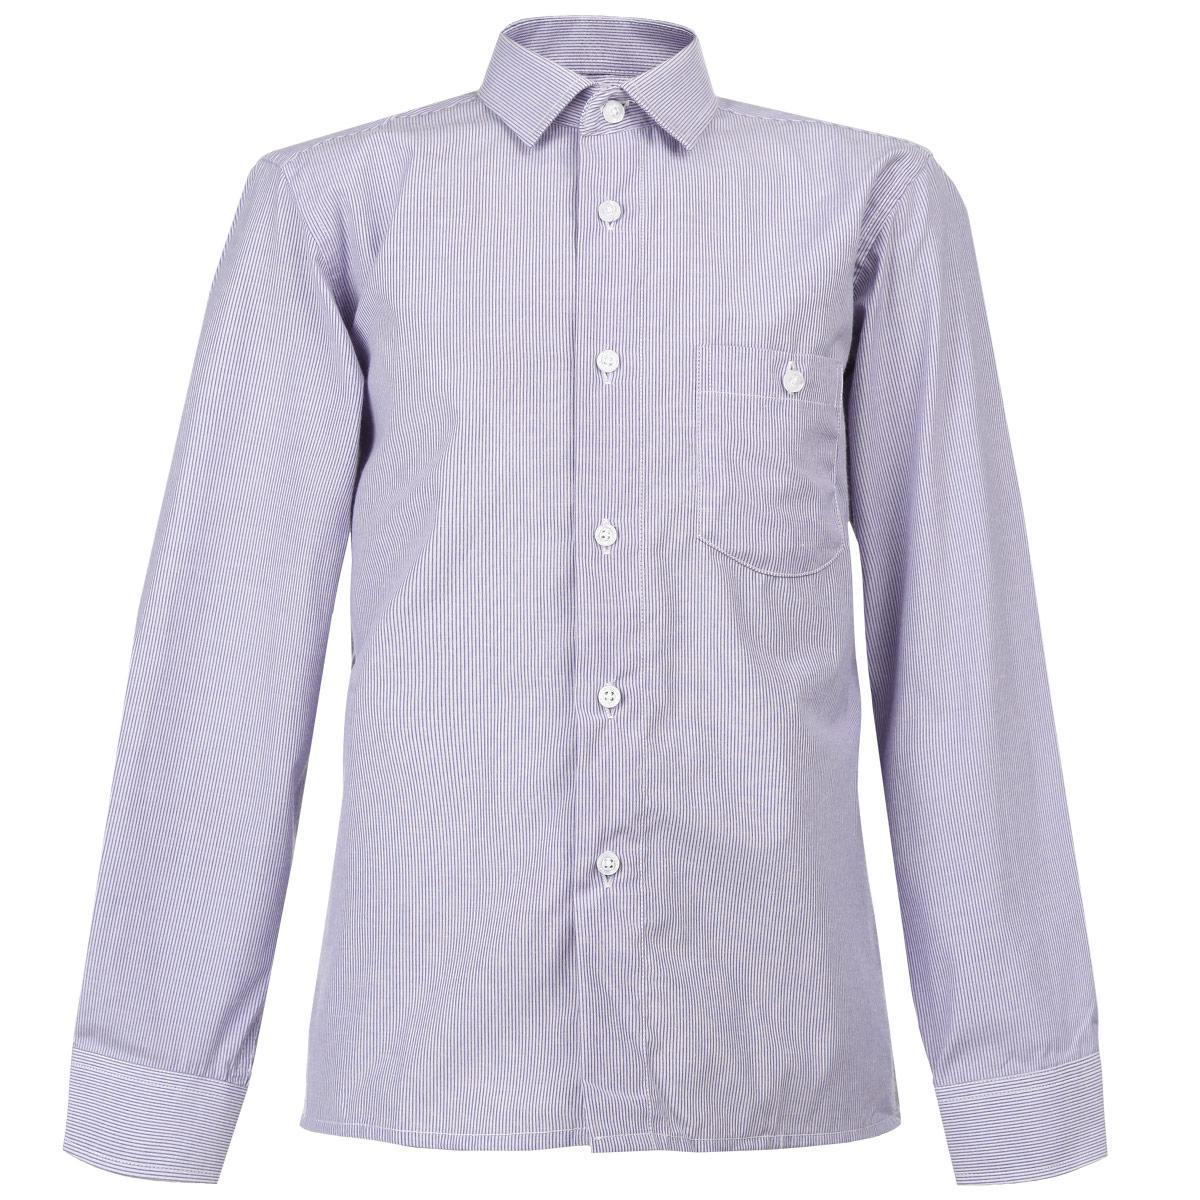 Tsarevich Рубашка для мальчика. W50